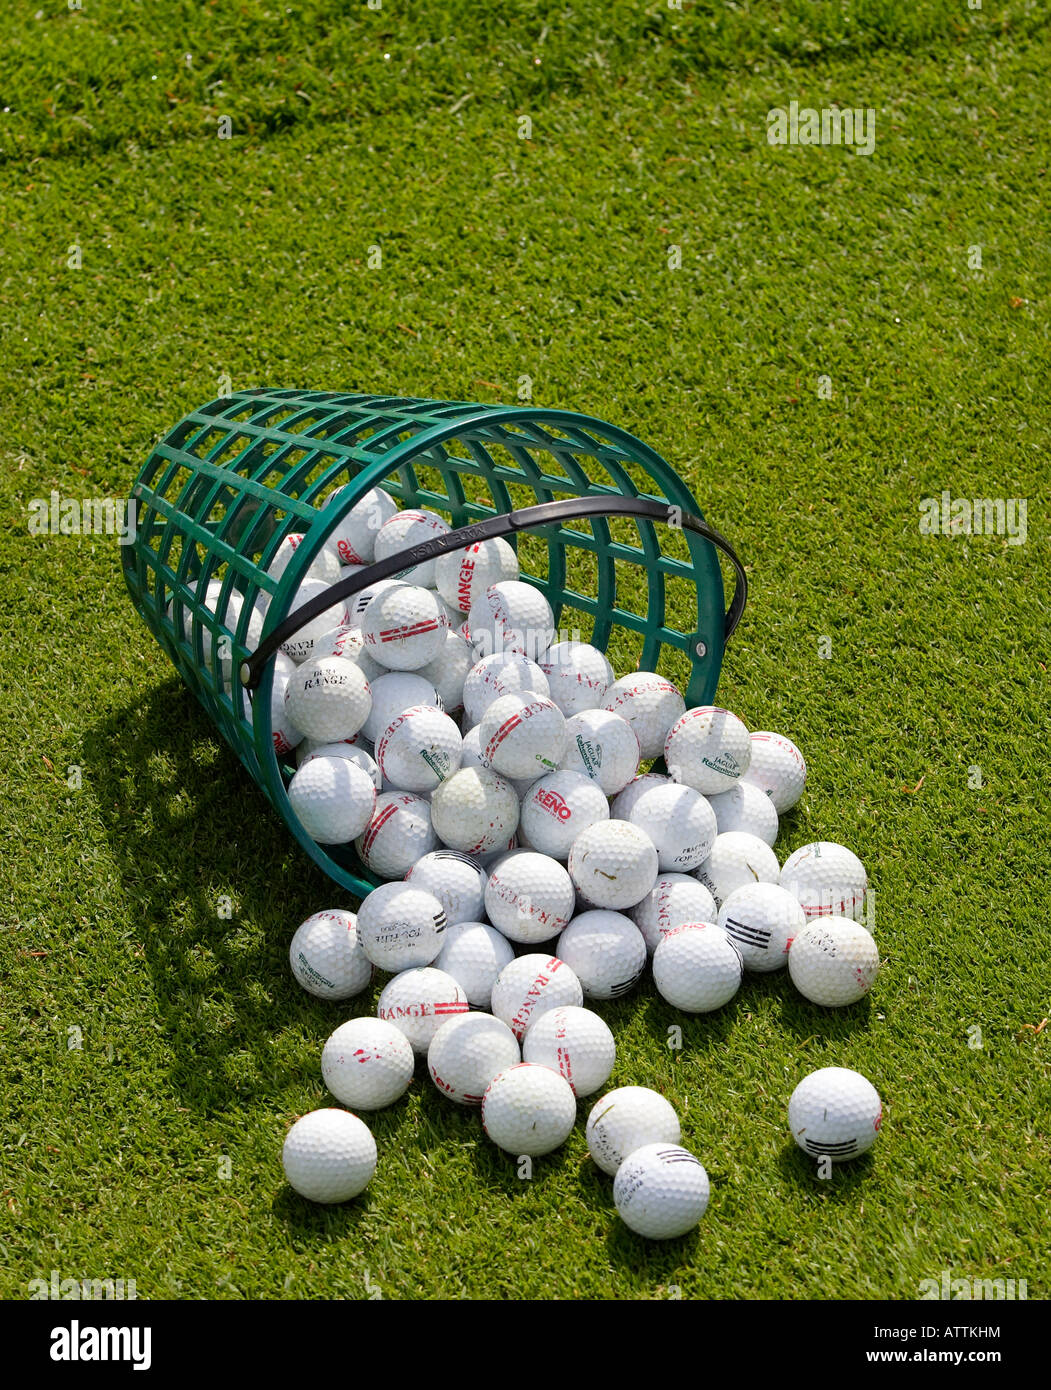 golf balls basket driving range stock photo 16389055 alamy rh alamy com Core Golf Balls Wooden Practice Golf Ball Metal Baskets